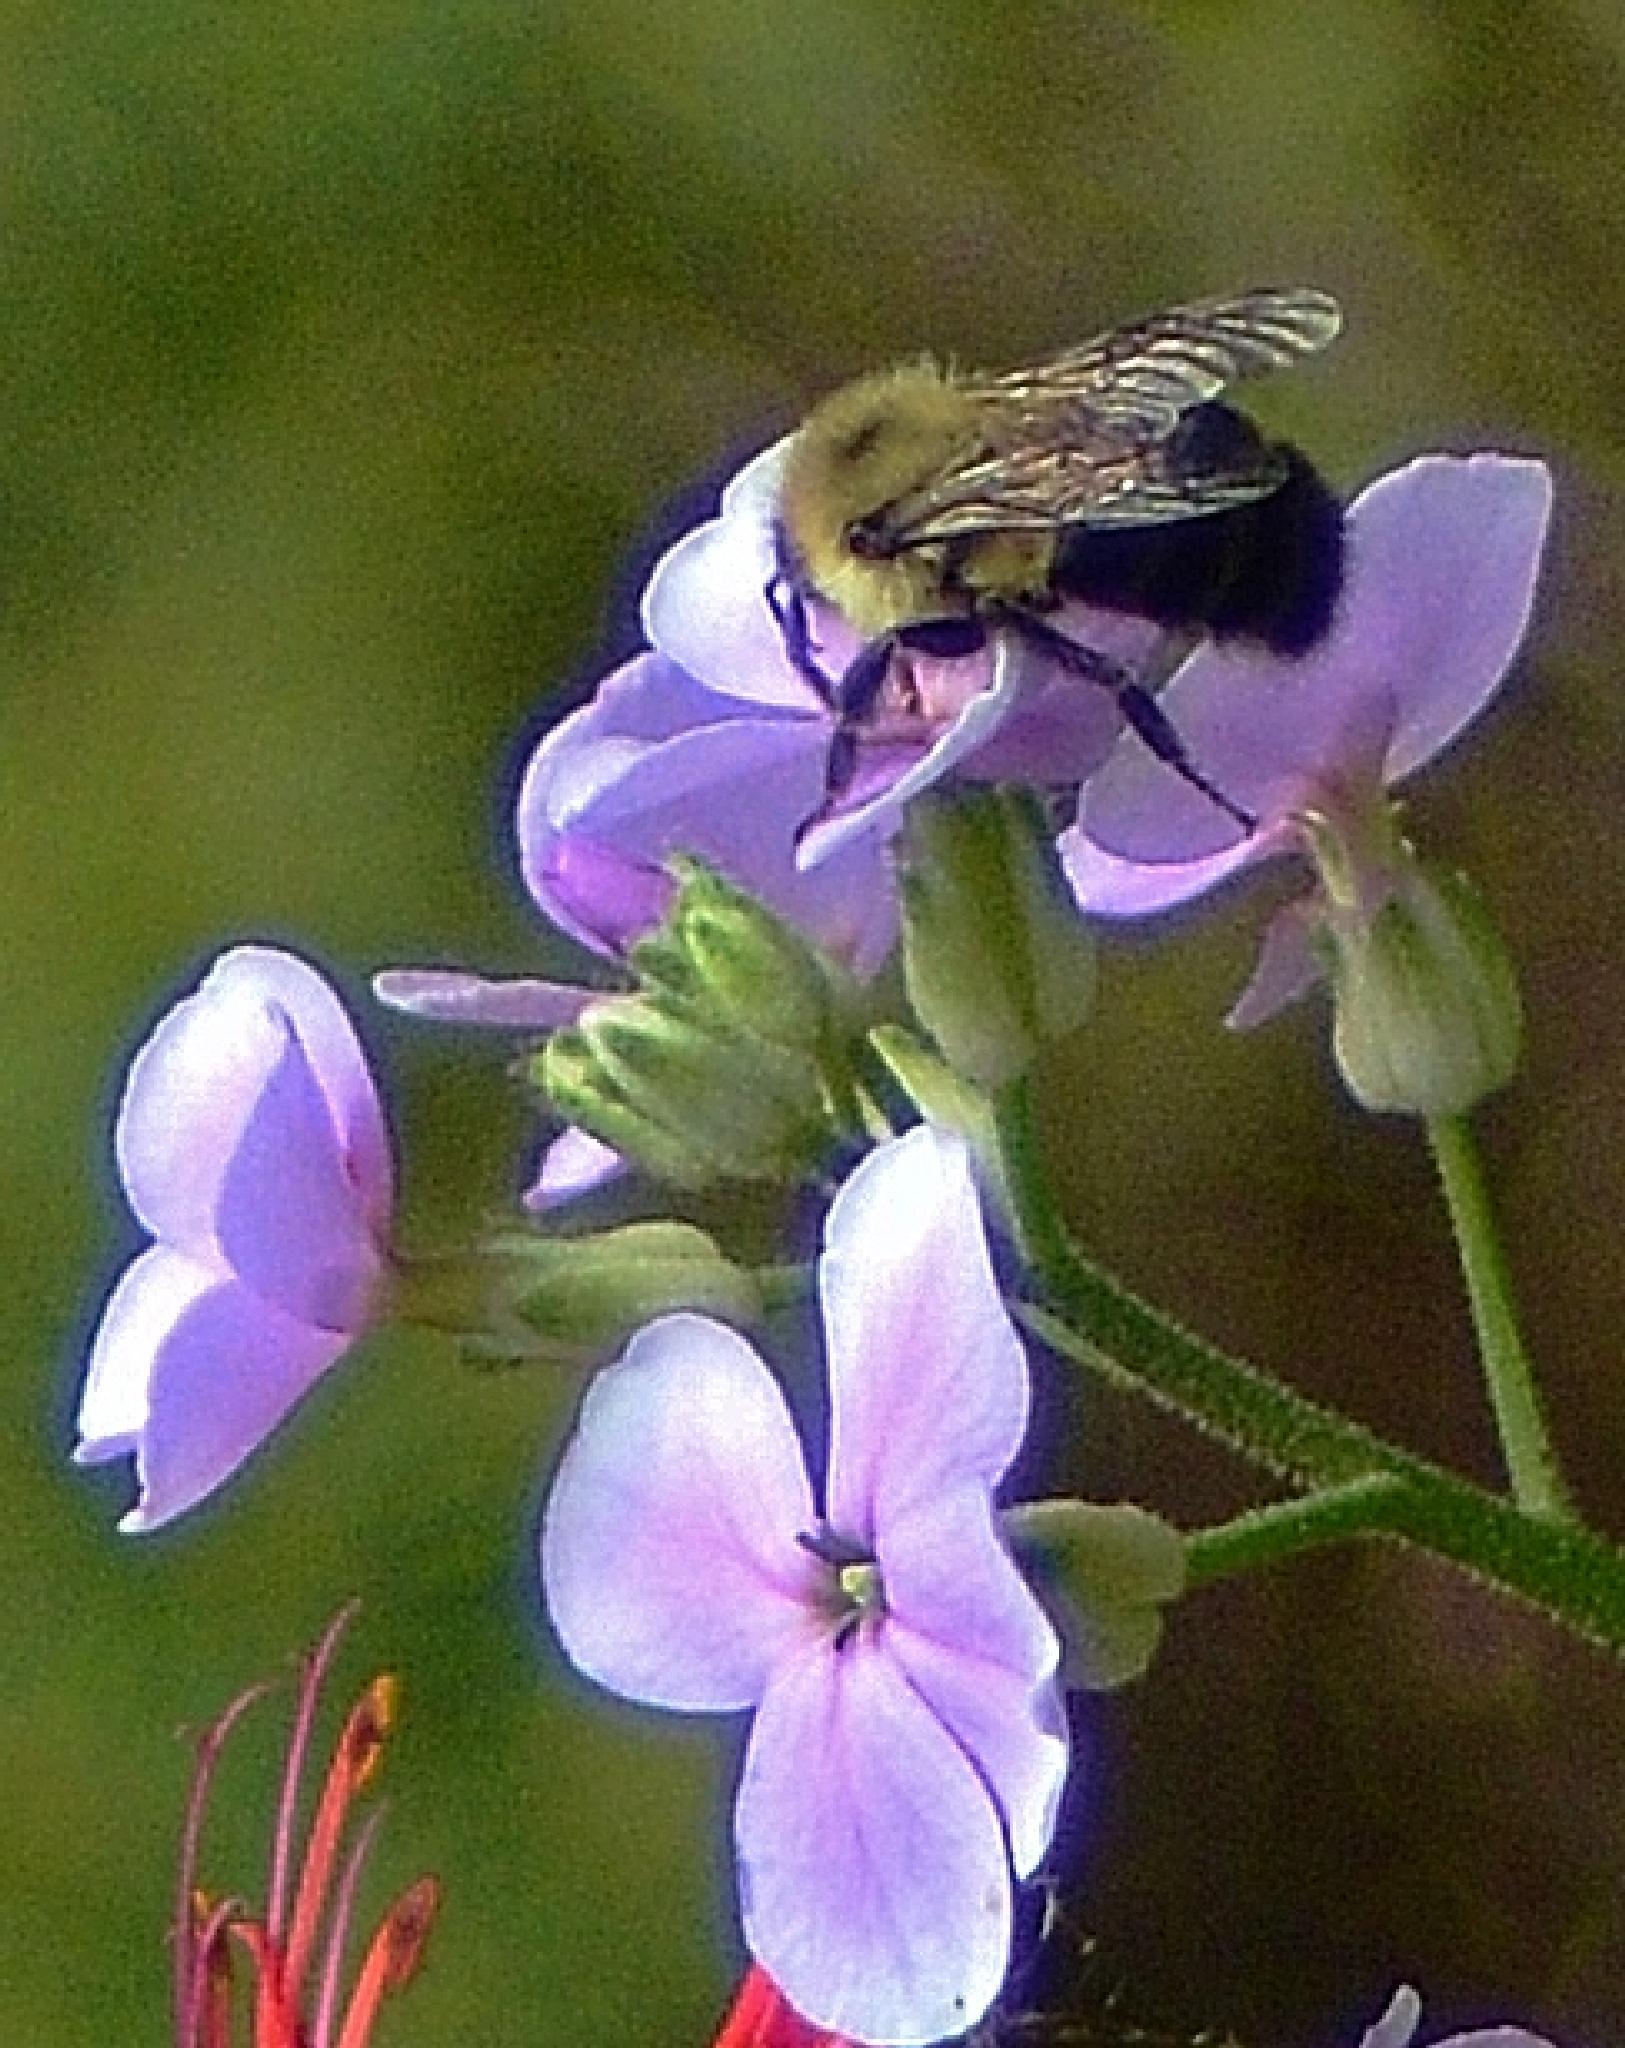 Humble Bumble Bee by sue hartman